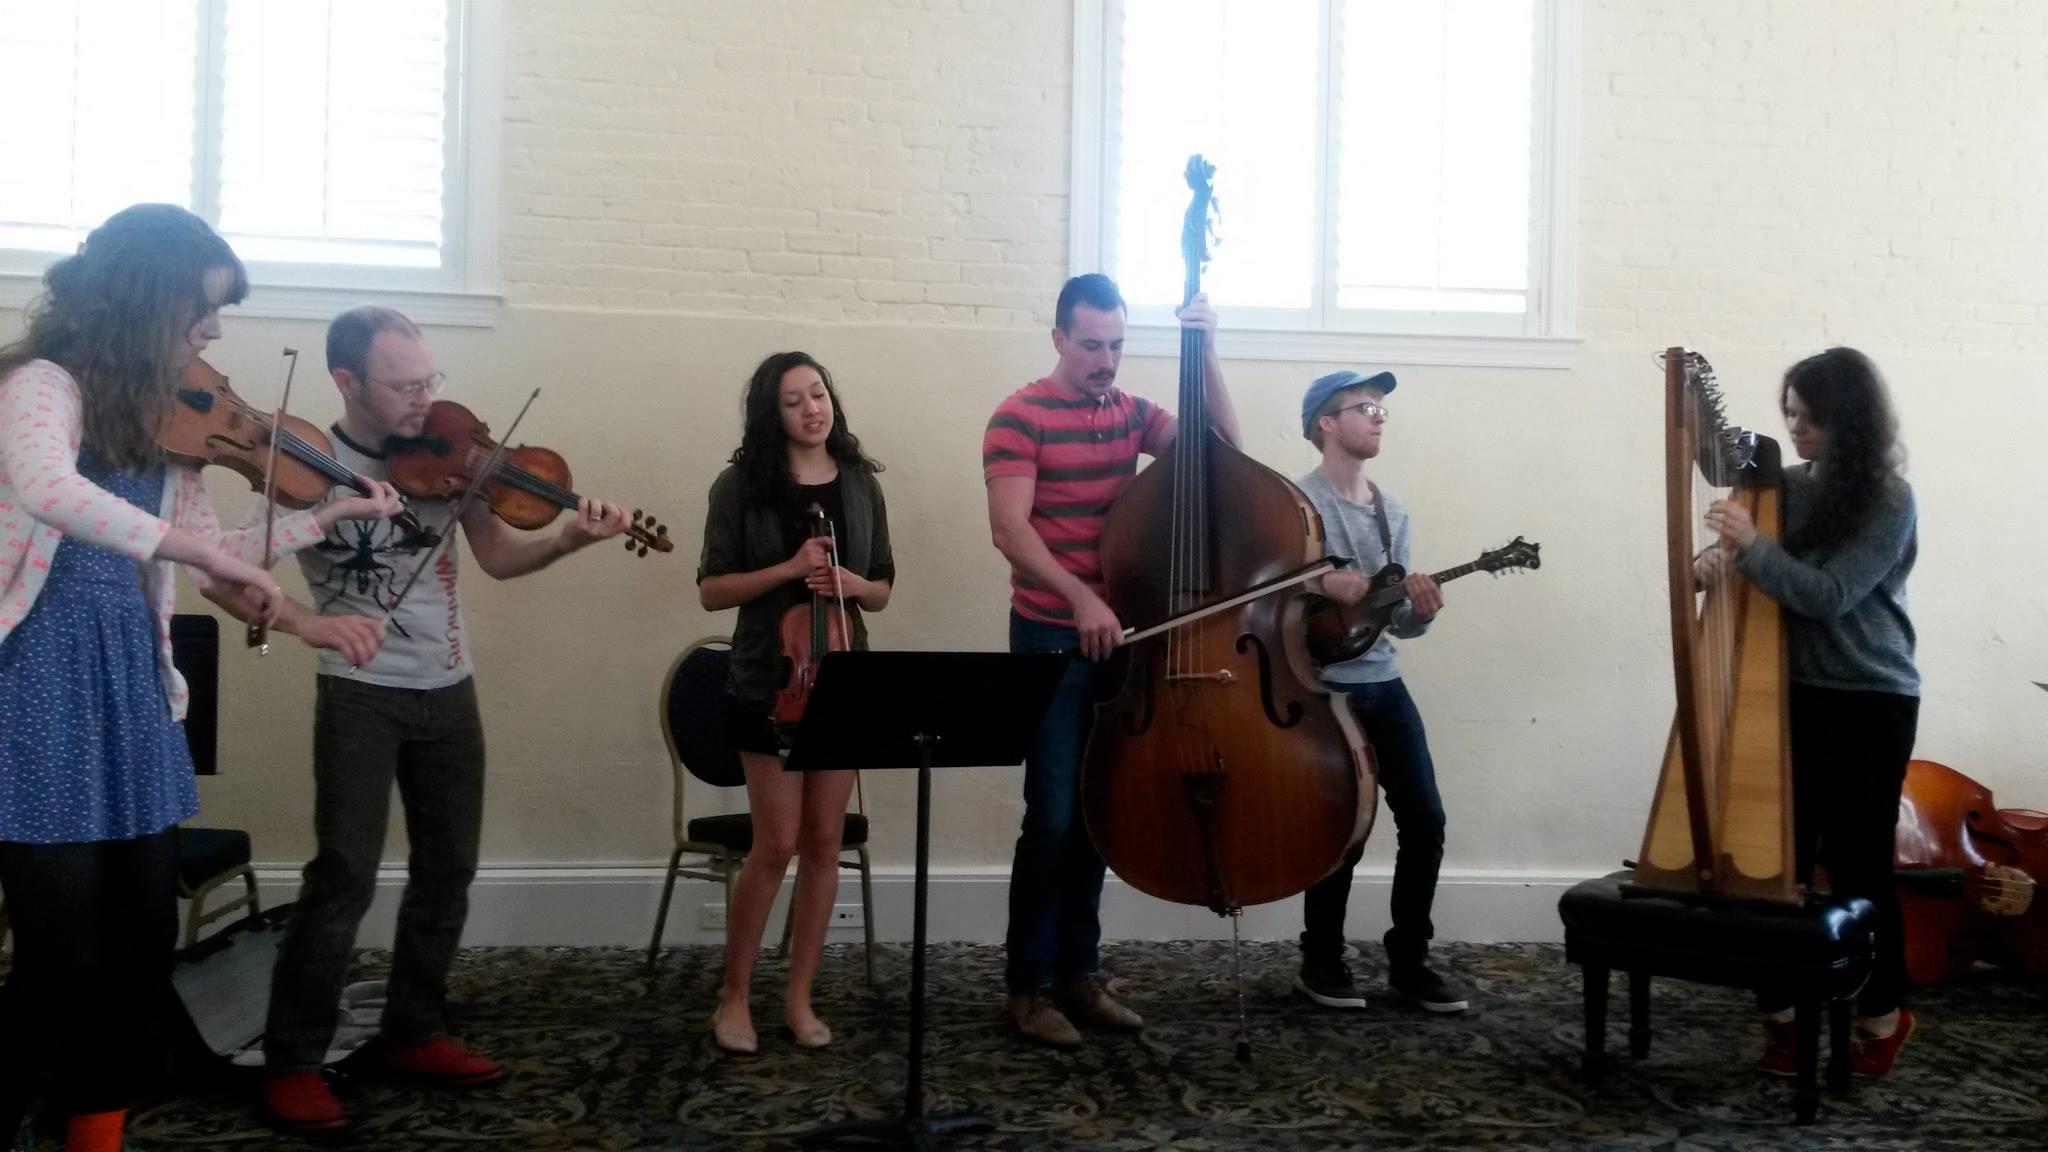 2014 Acoustic Music Seminar at the Savannah Music Festival